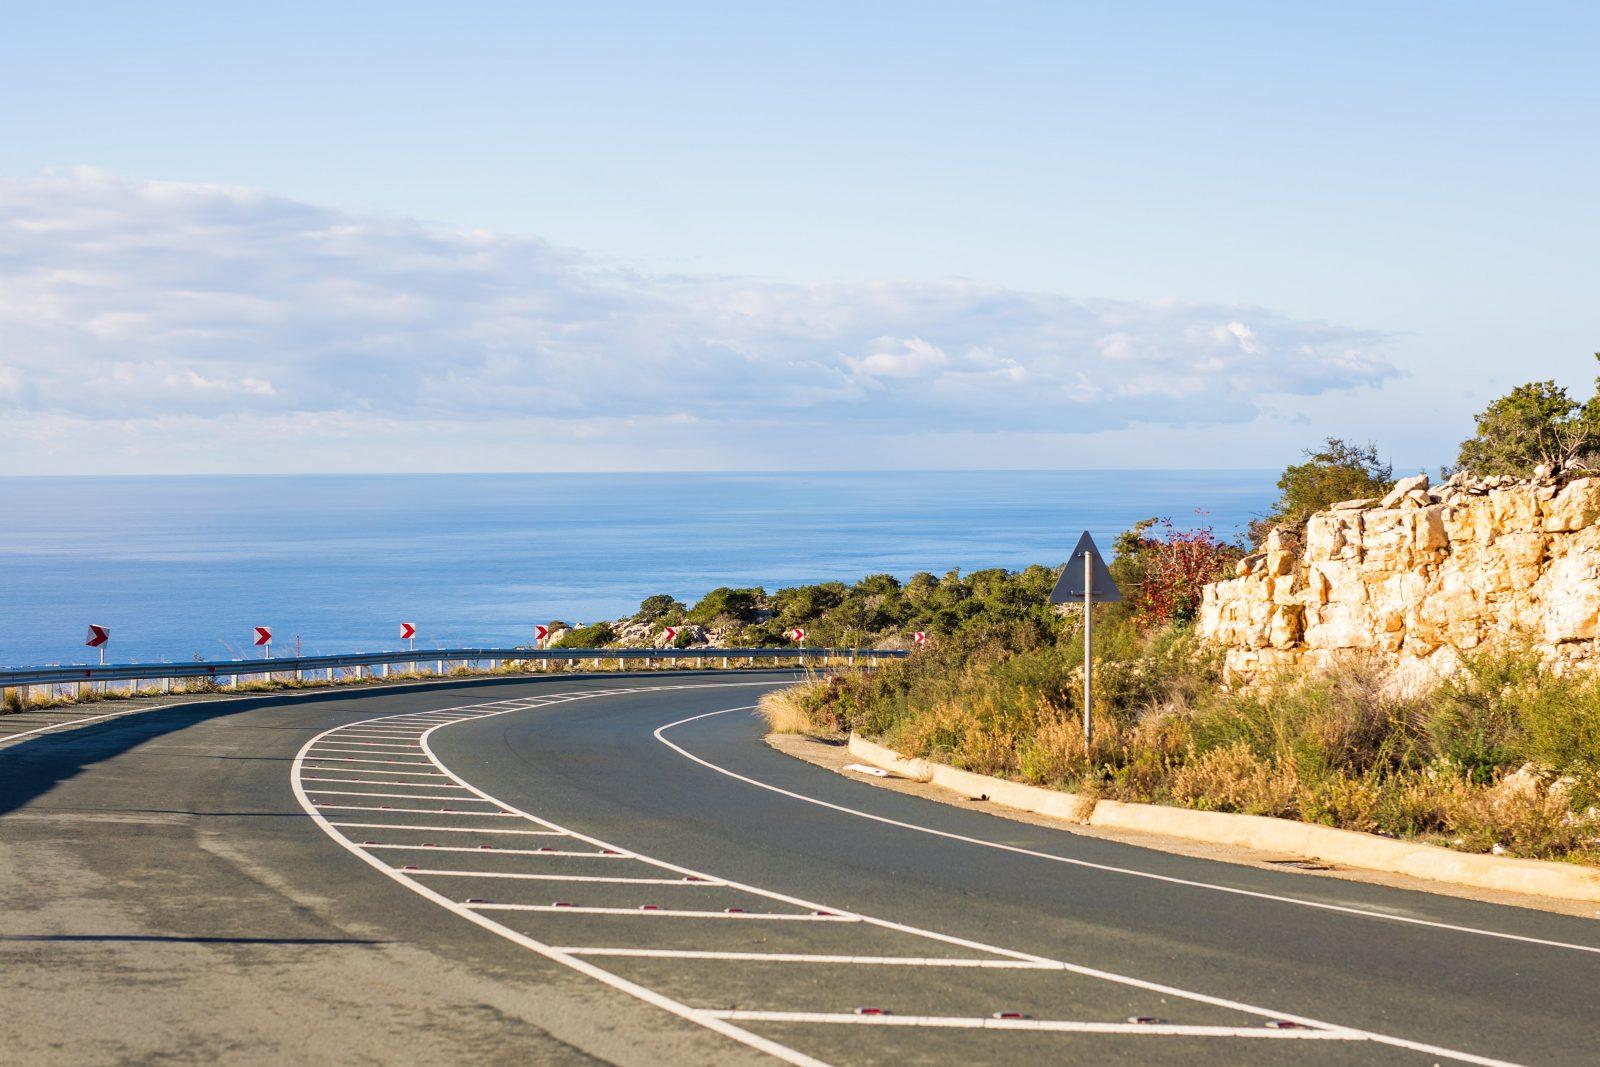 Europcar Car Hire, Kalgoorlie, Western Australia